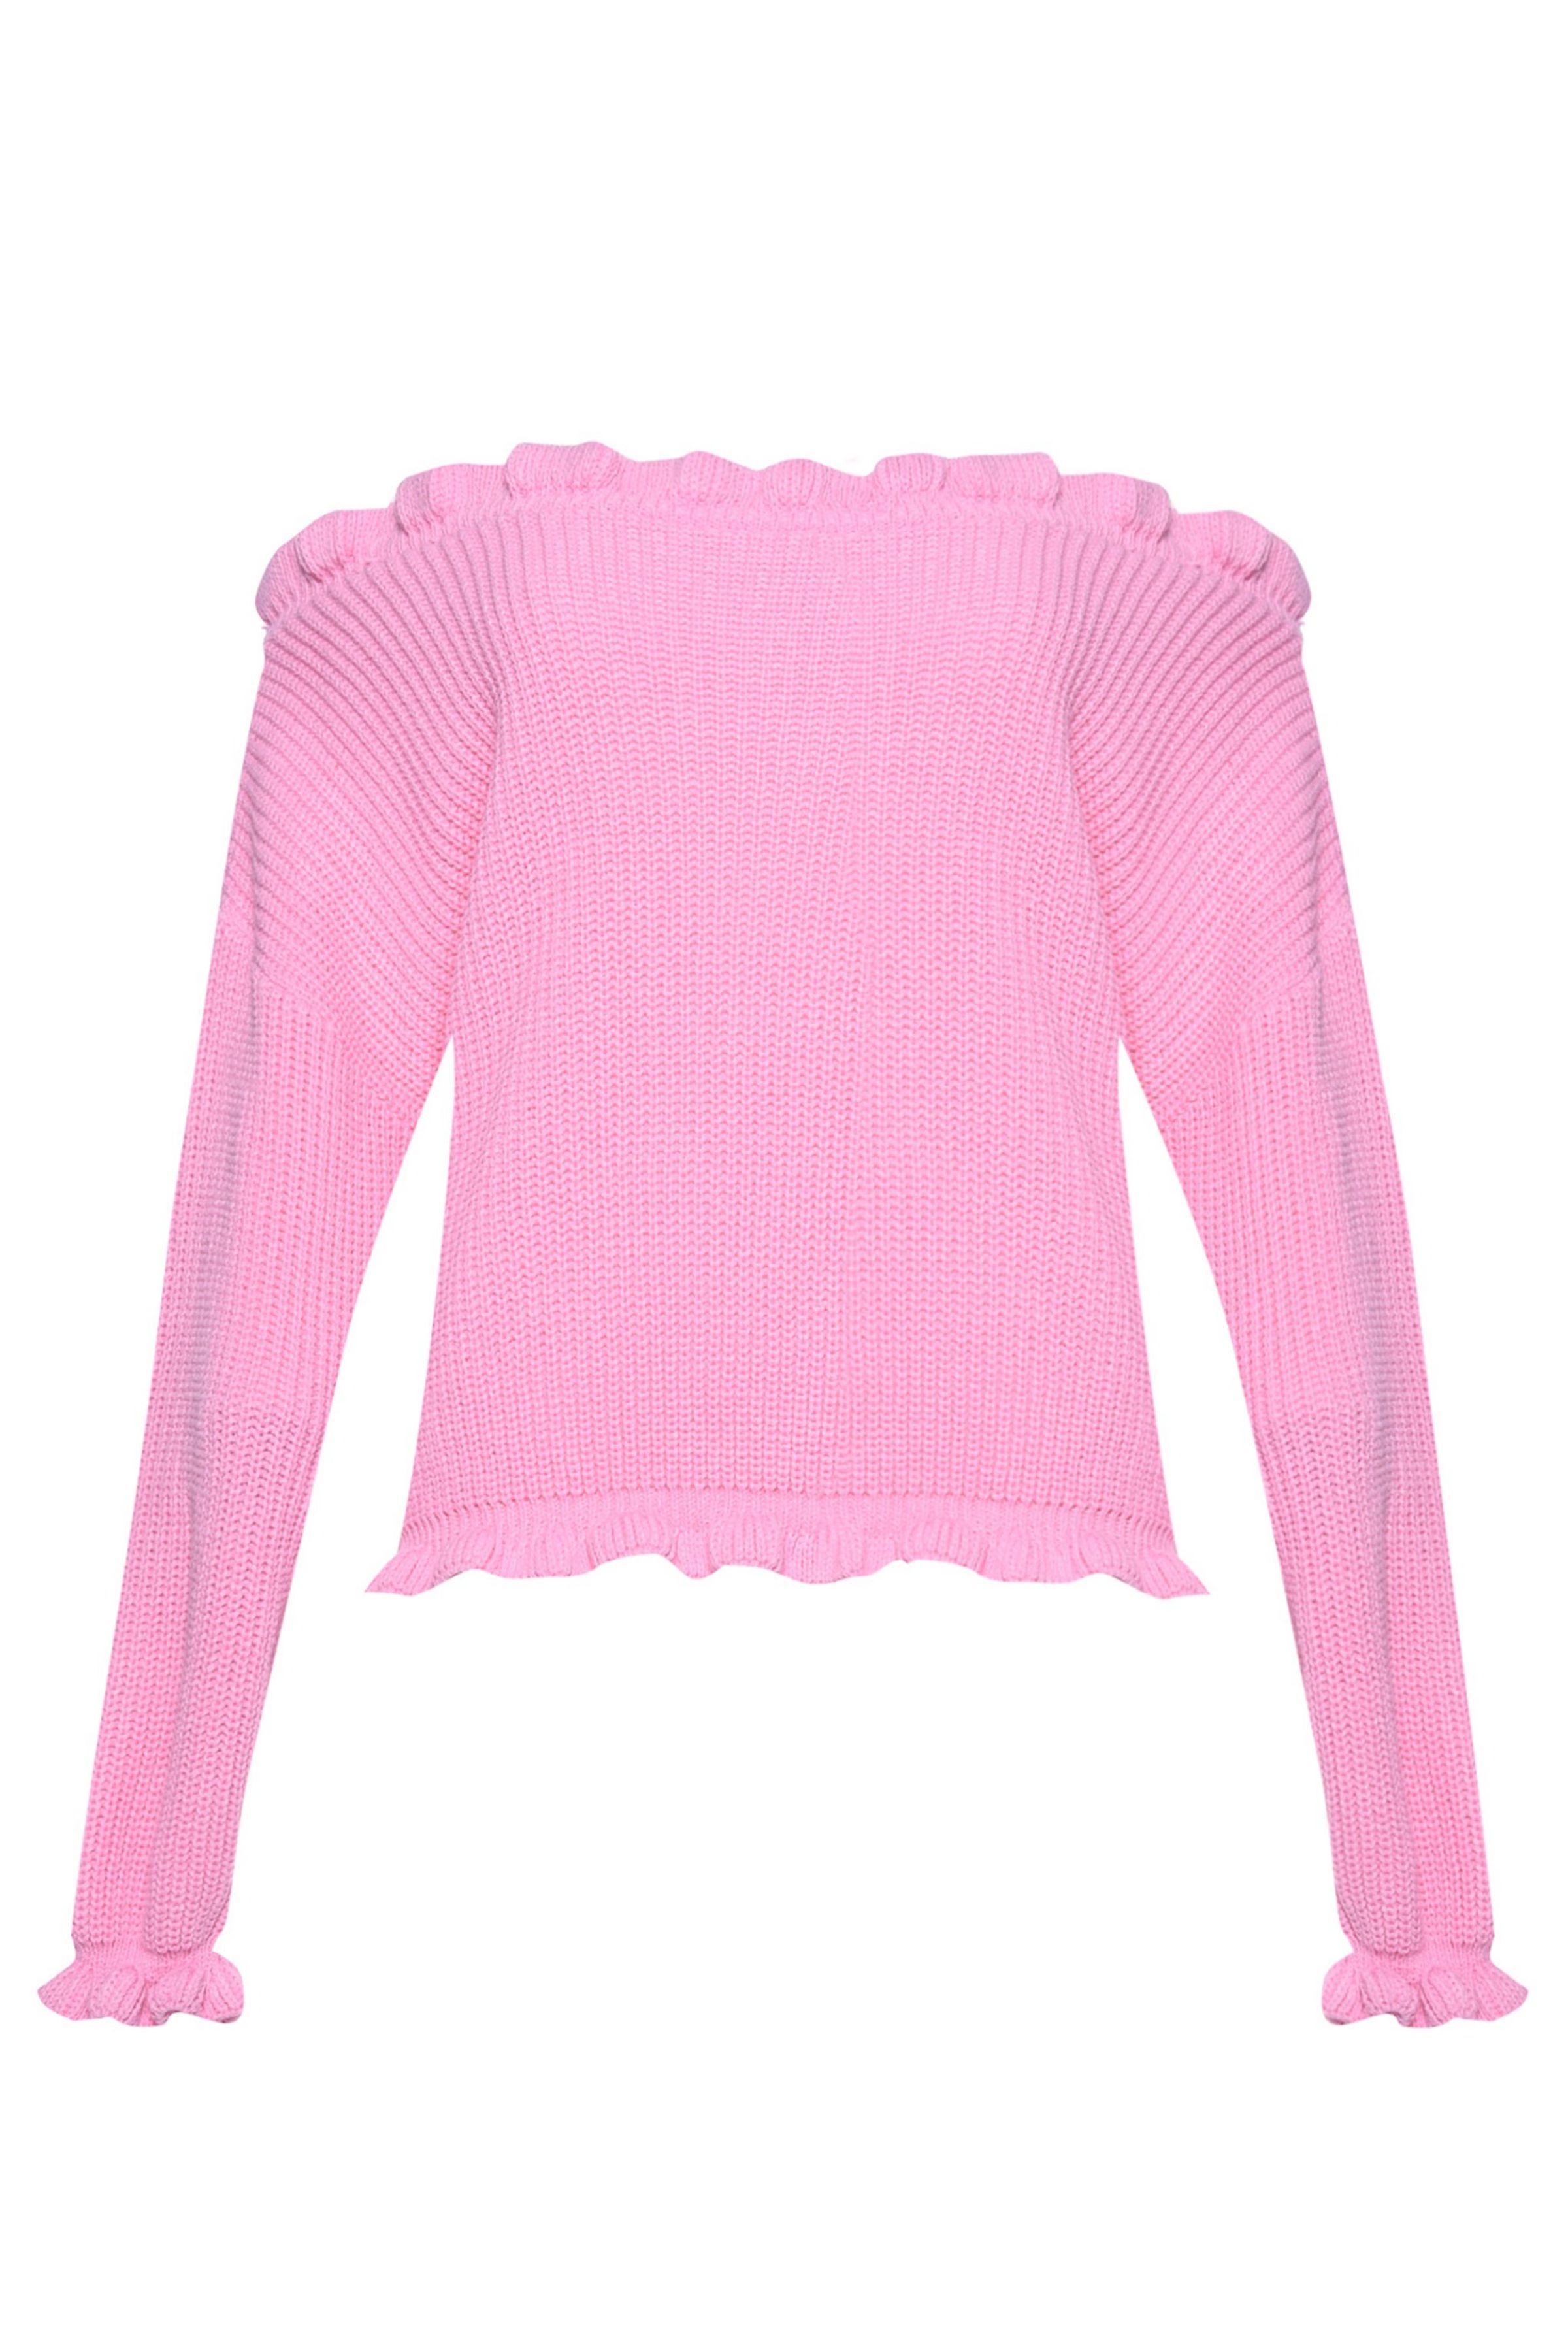 Gebreide-roze-trui